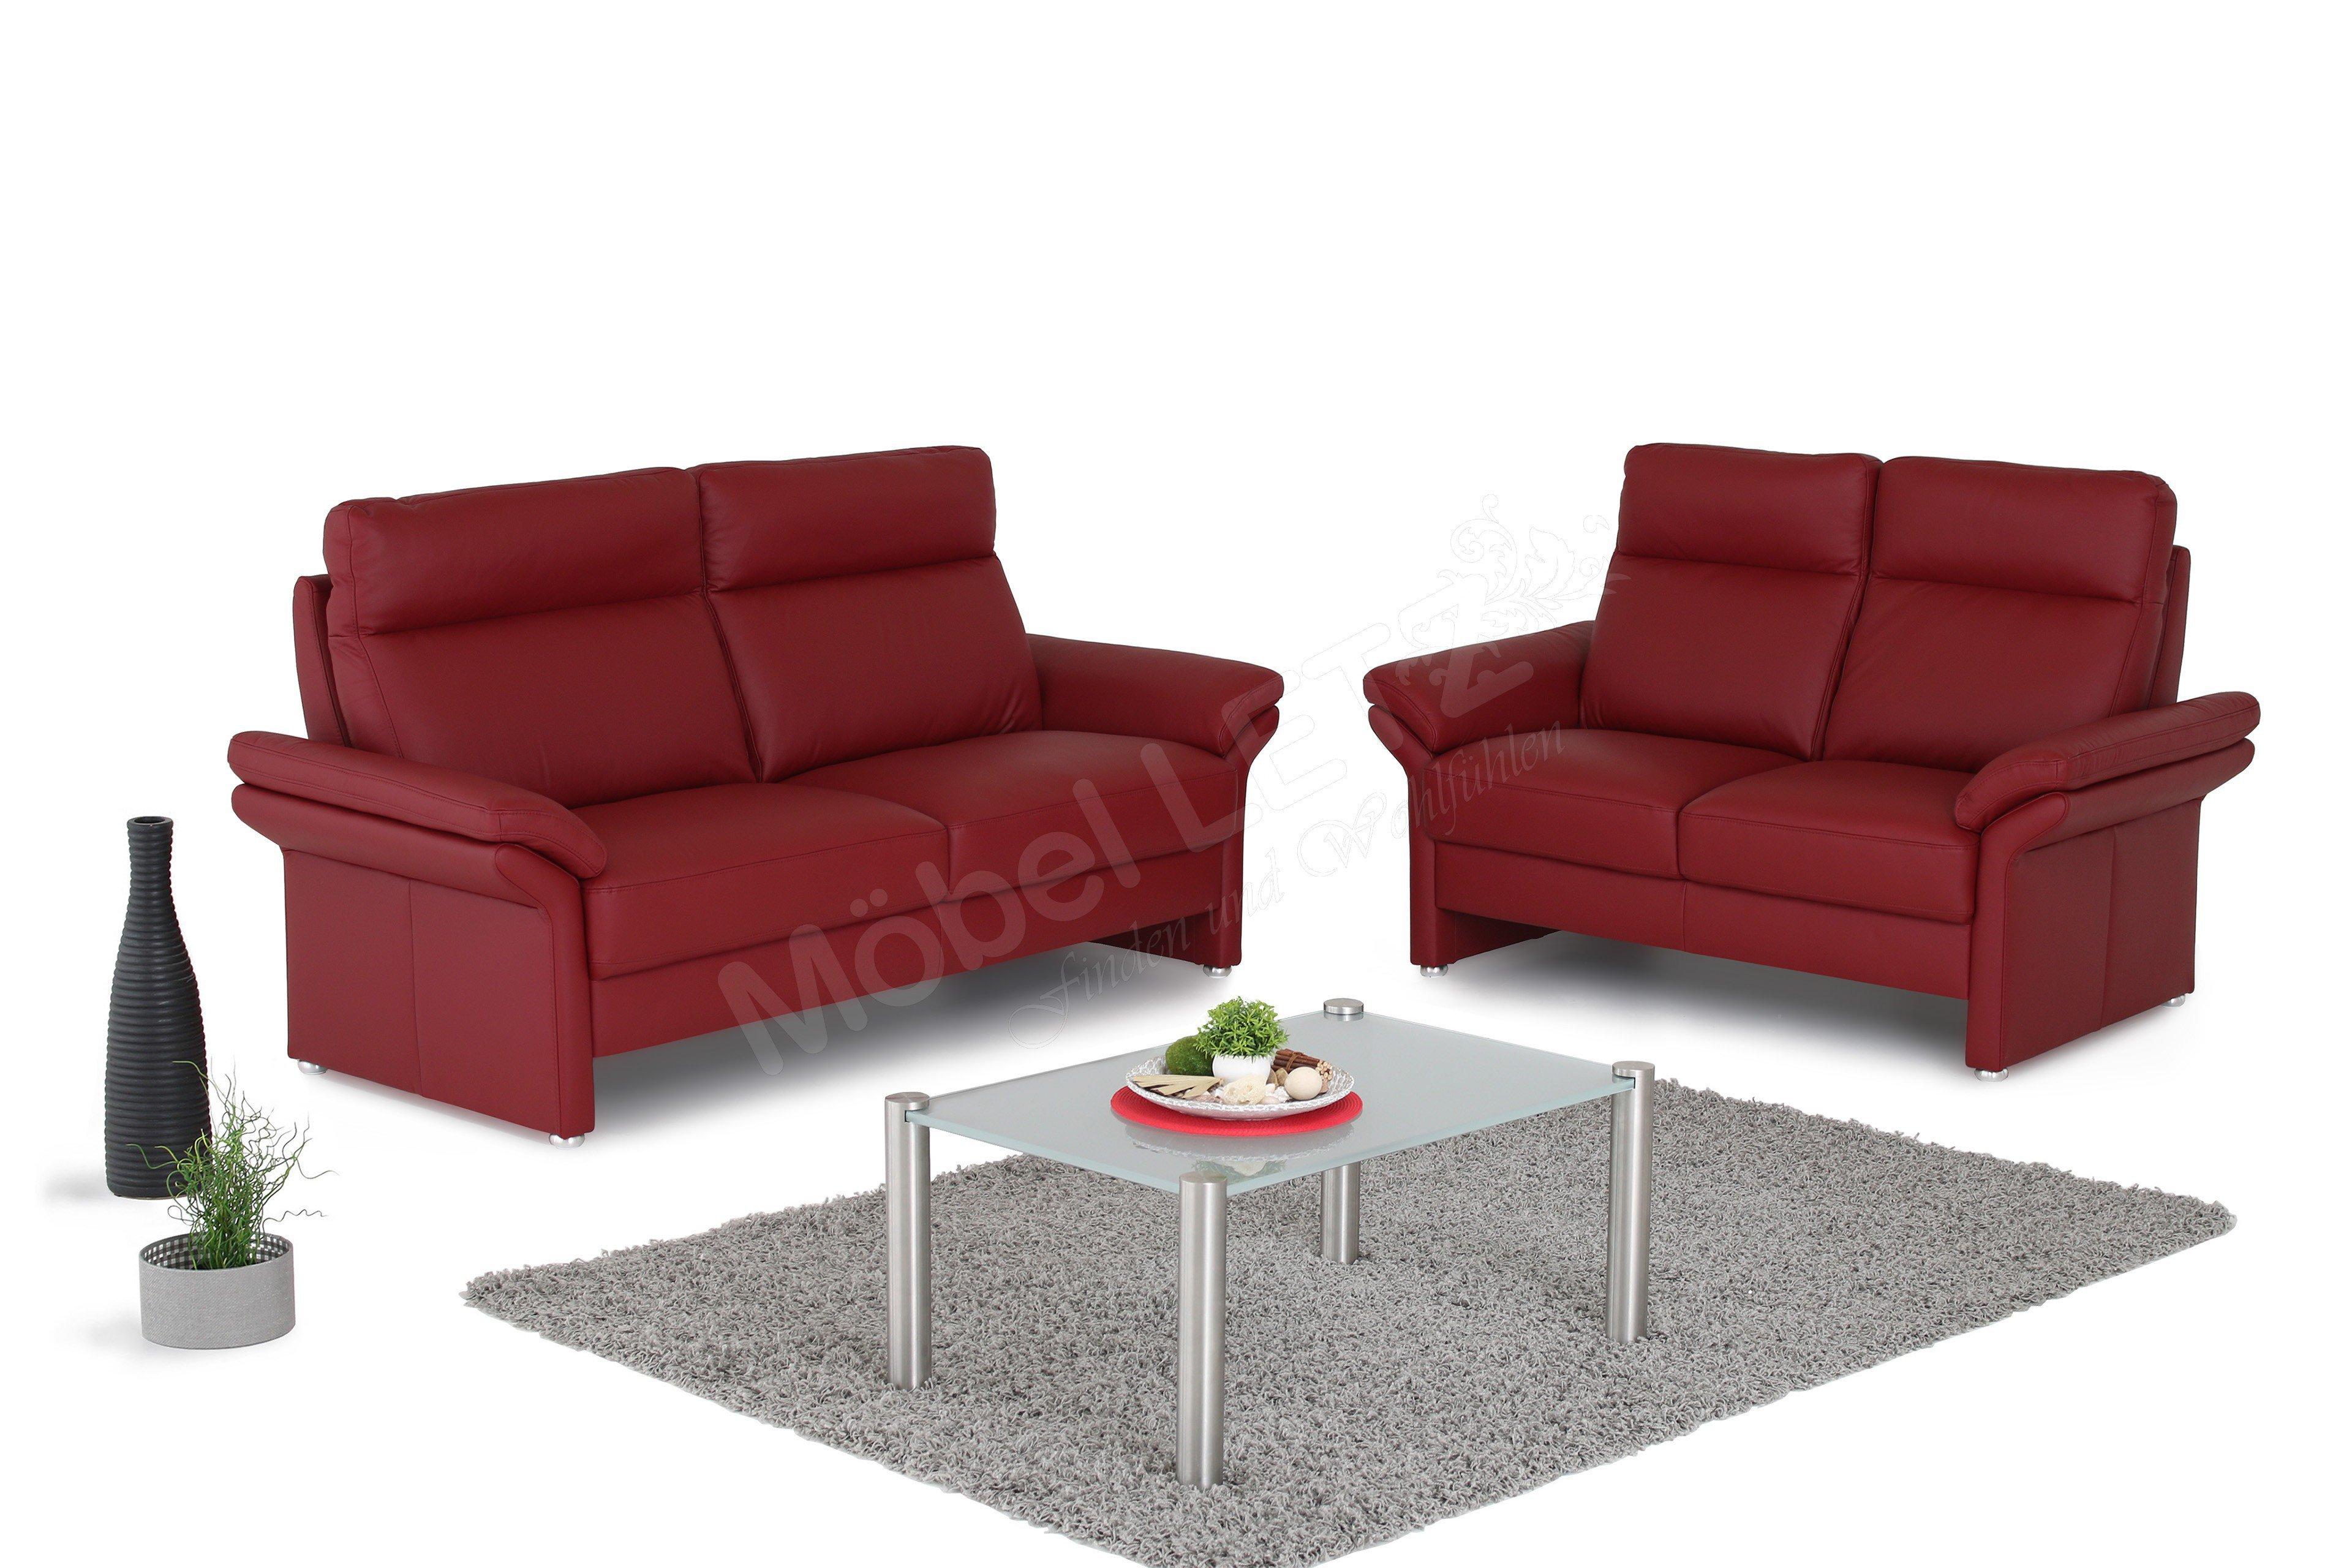 polstermbel dietsch good amazing kw polstermbel mezzo einzelsofa sofa sitzig sofa sitzig with. Black Bedroom Furniture Sets. Home Design Ideas